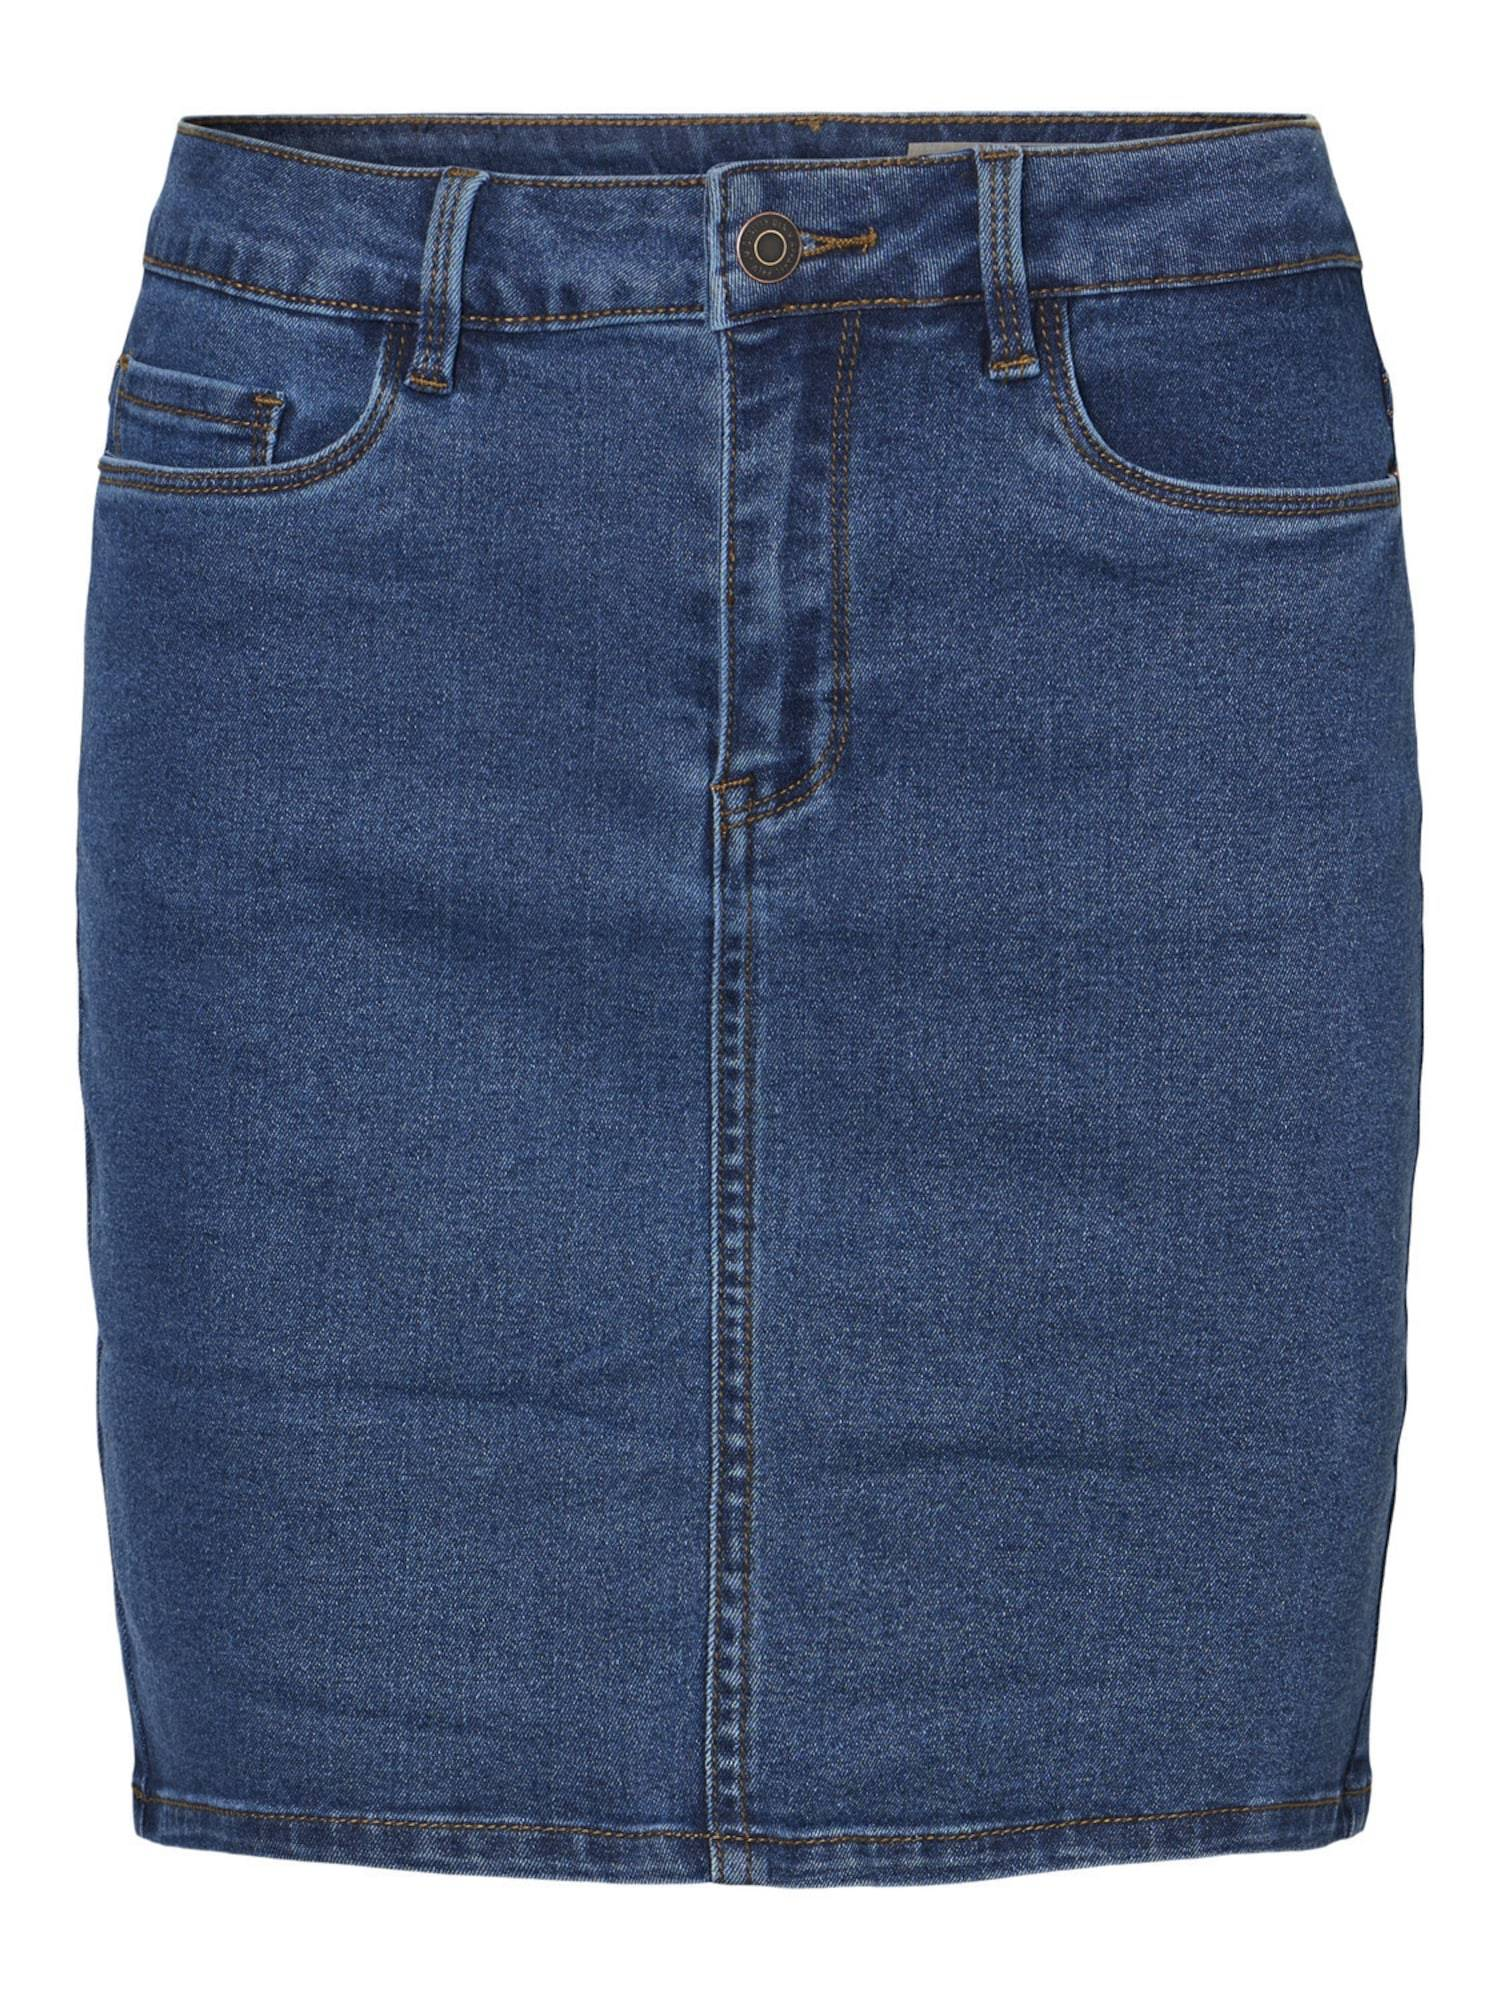 VERO MODA Jupe 'Hot Seven'  - Bleu - Taille: L - female